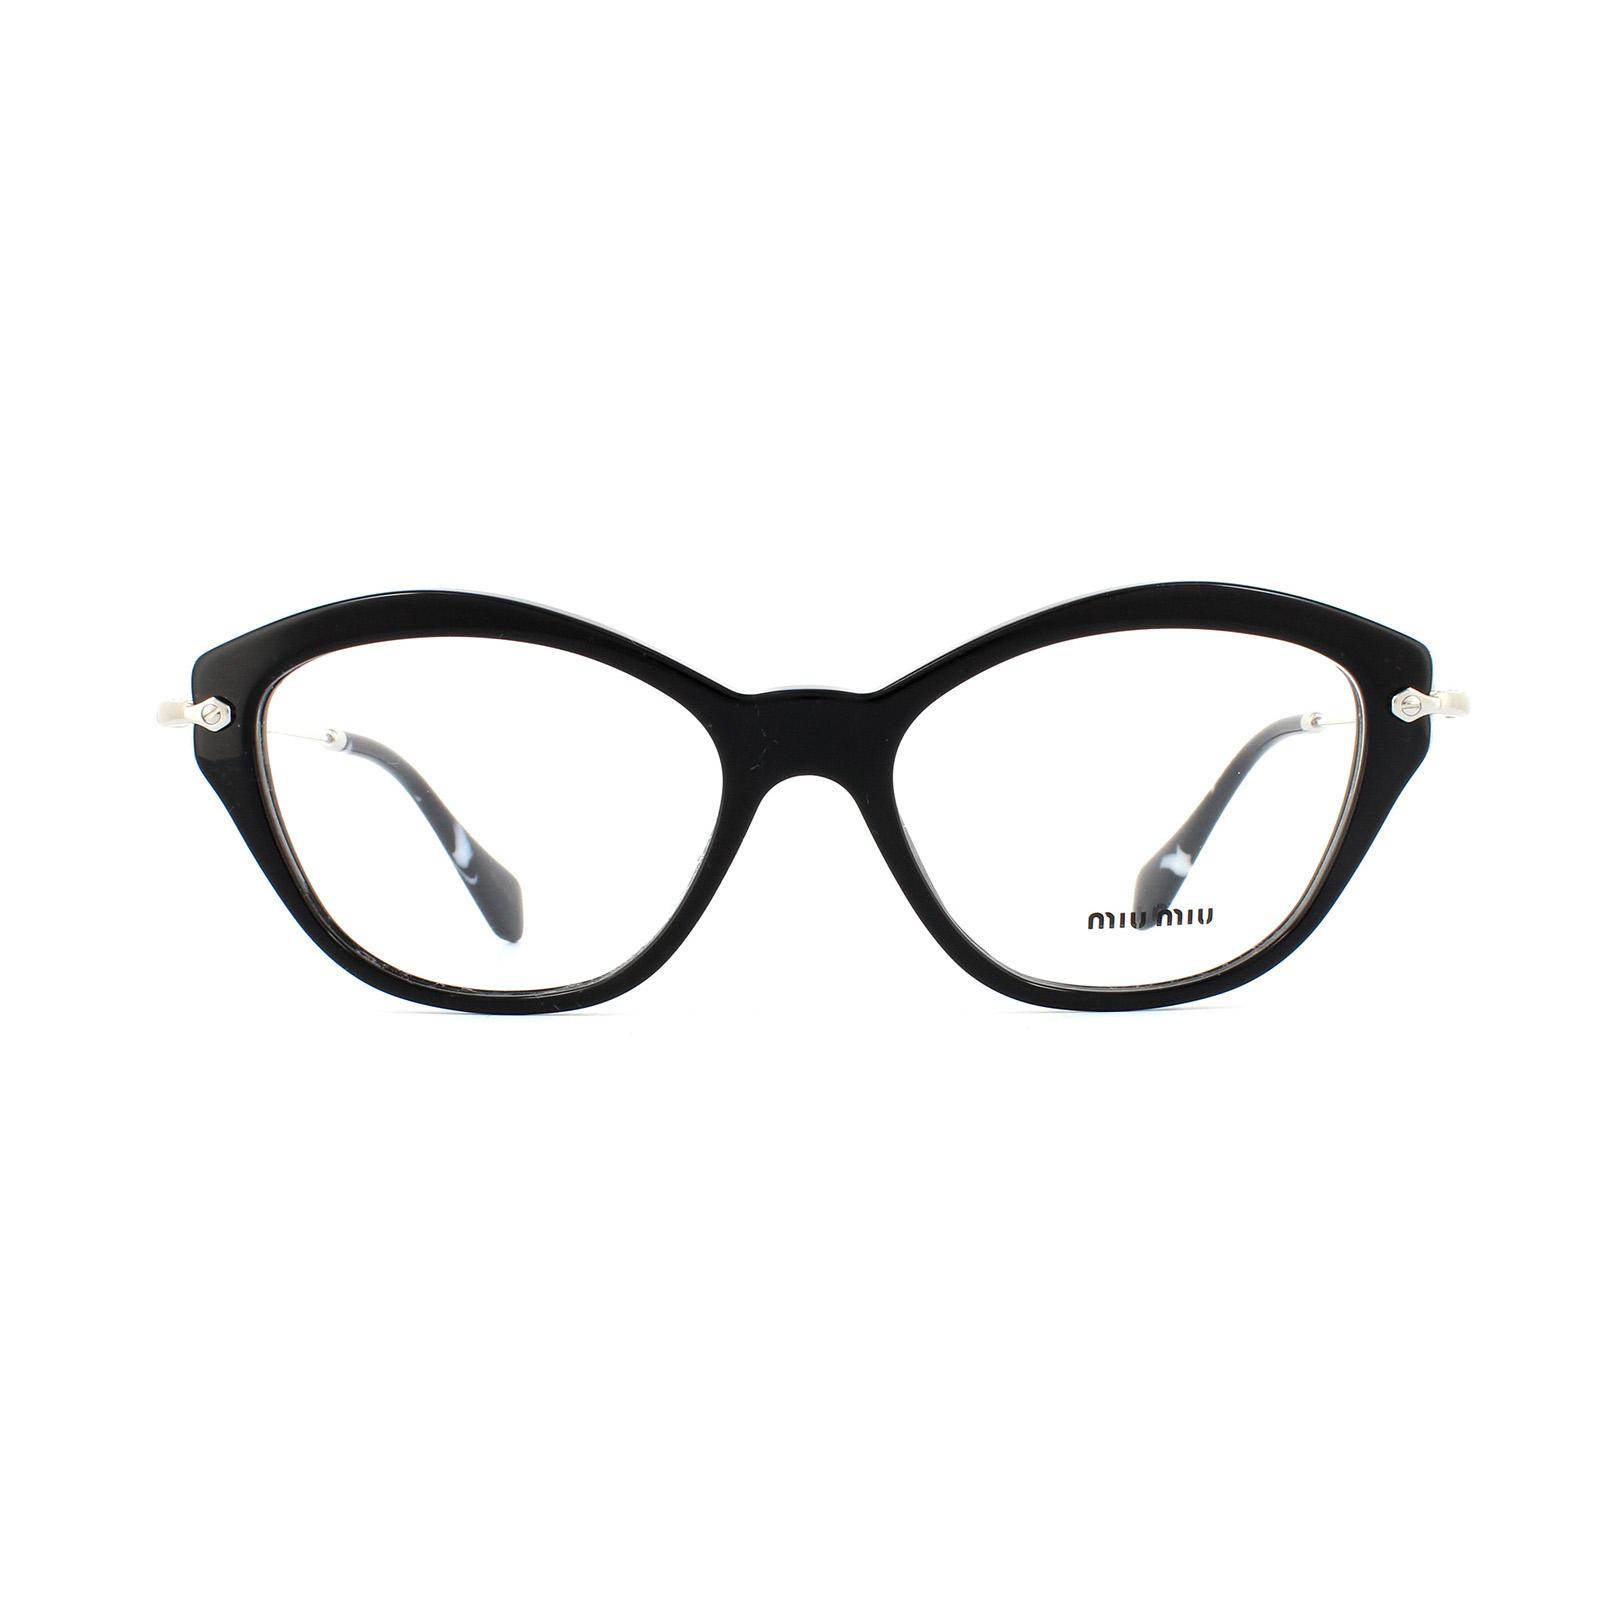 sentinel miu miu glasses frames 02ov 1ab1o1 black womens 54mm - Miu Miu Optical Frames